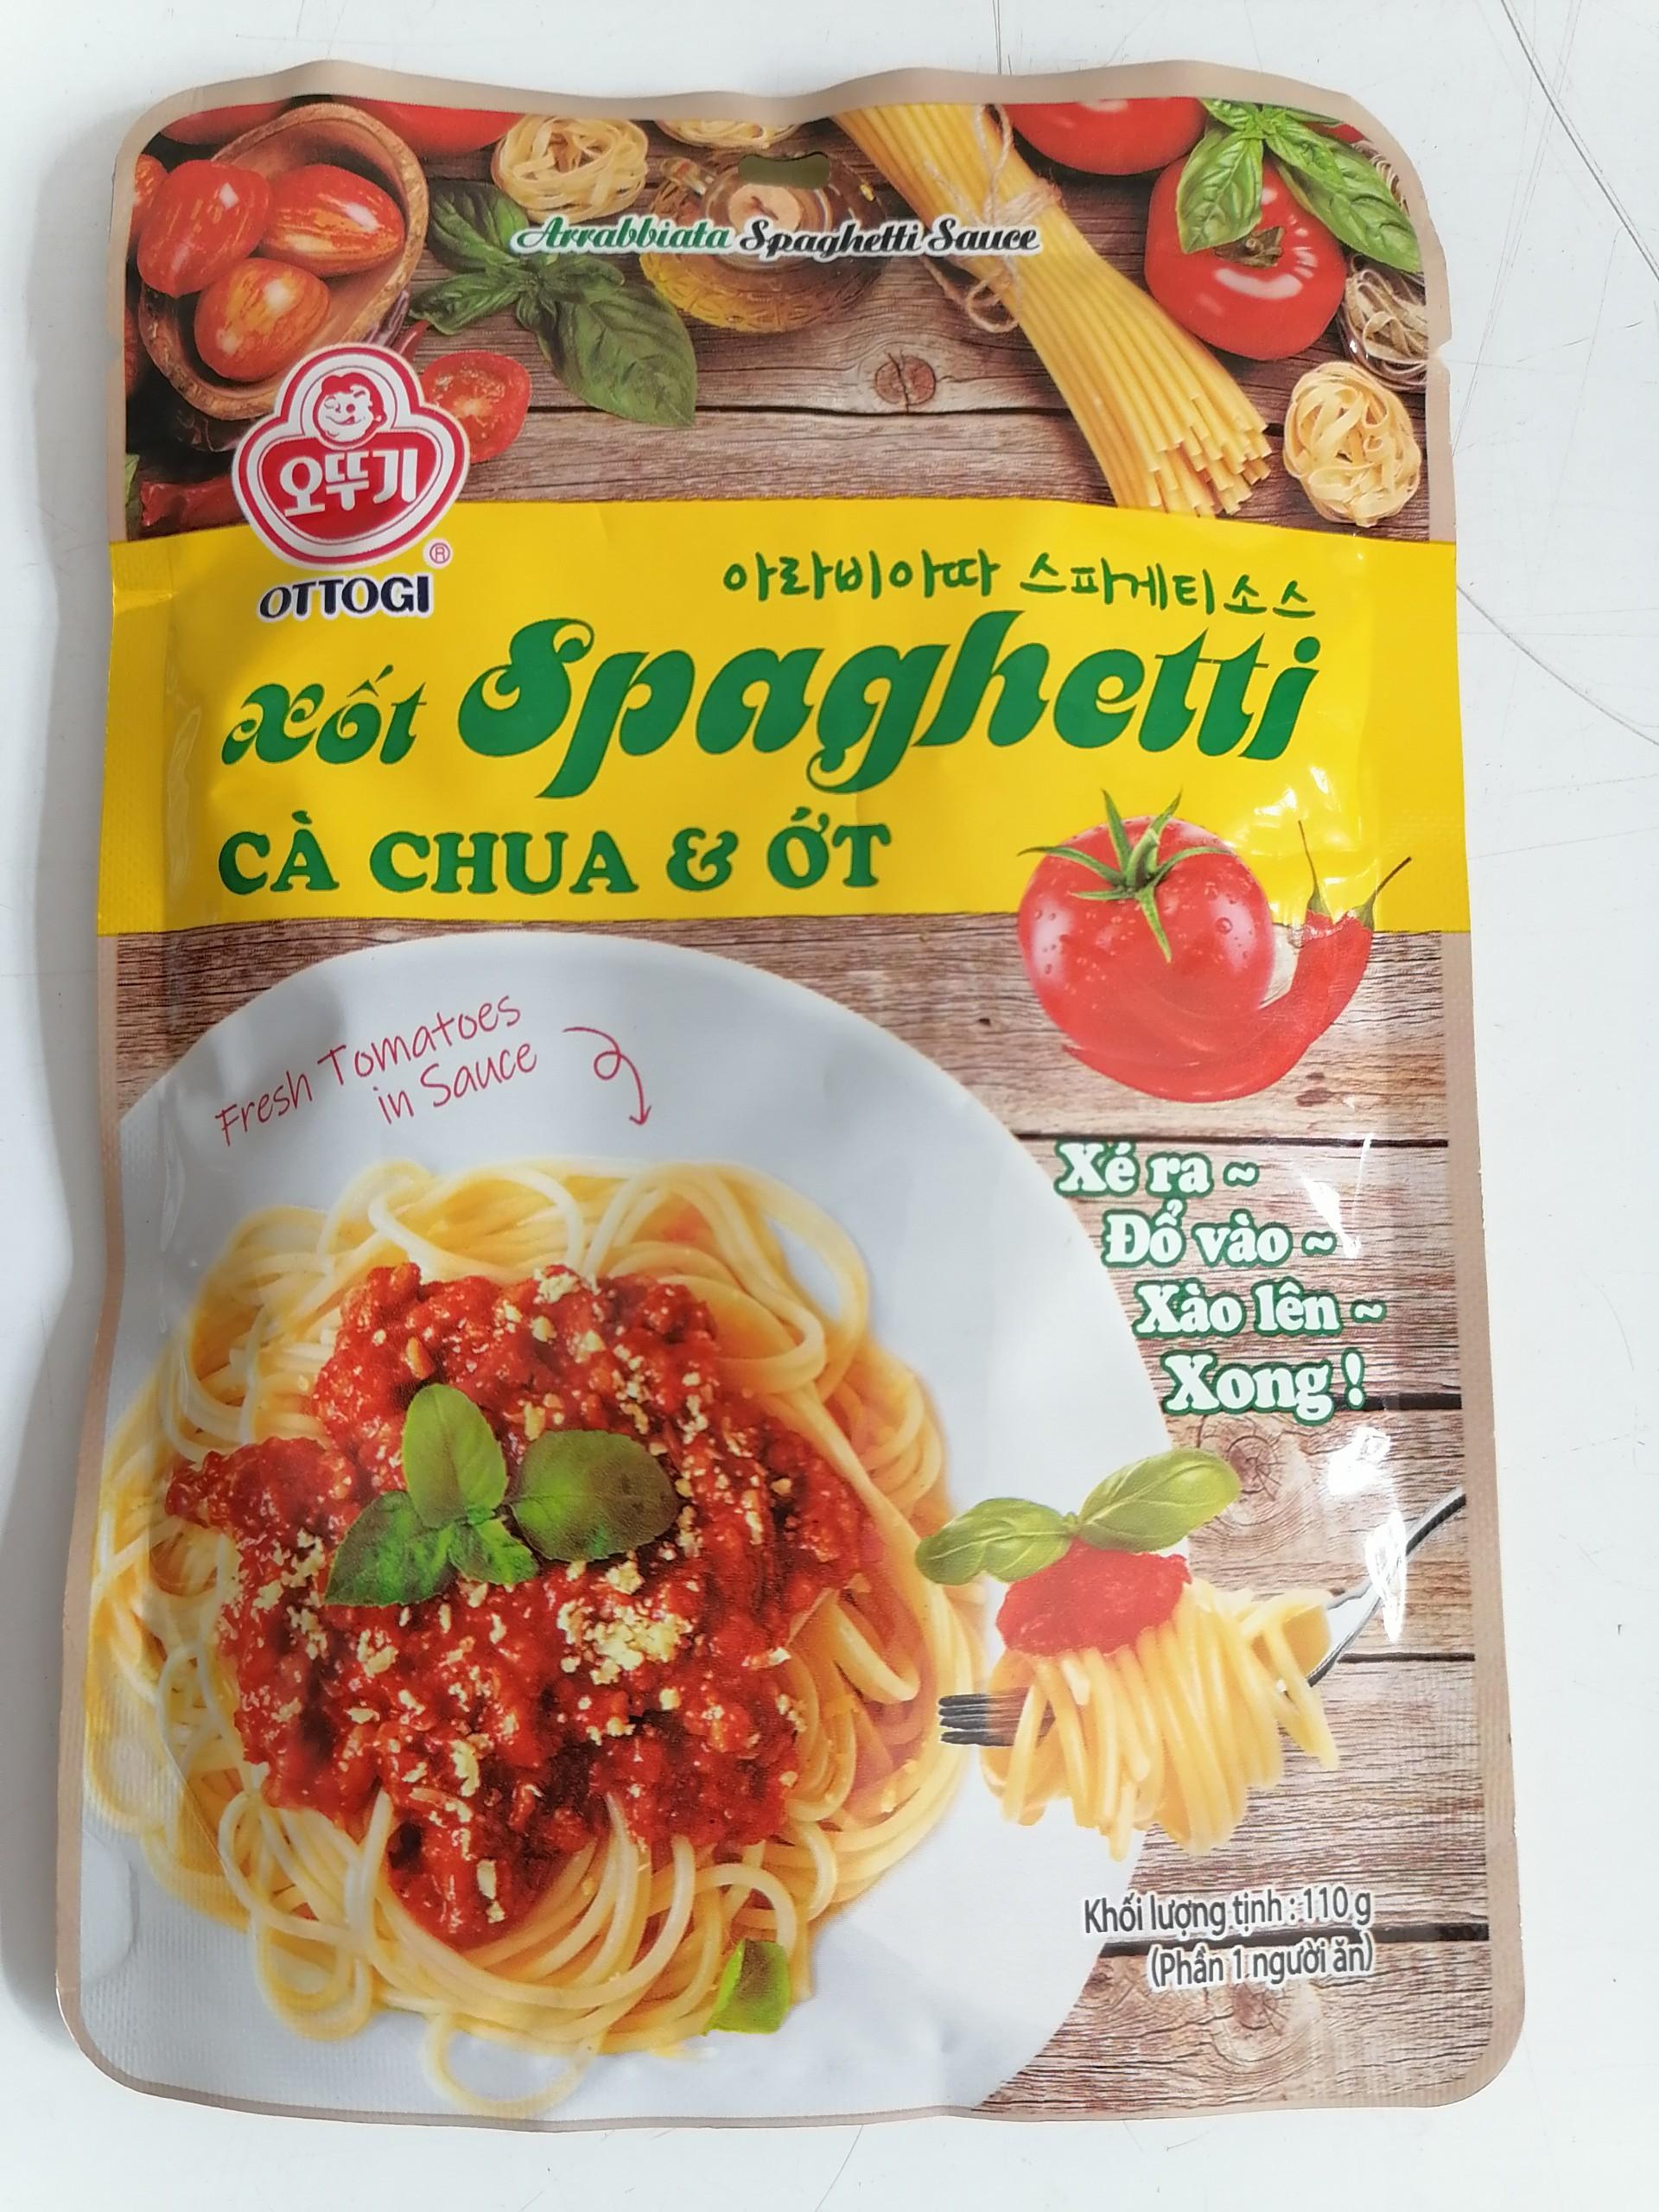 Xốt mì Ý cà chua & ớt OTTOGI Arrabbiata Spaghetti Sauce 110g